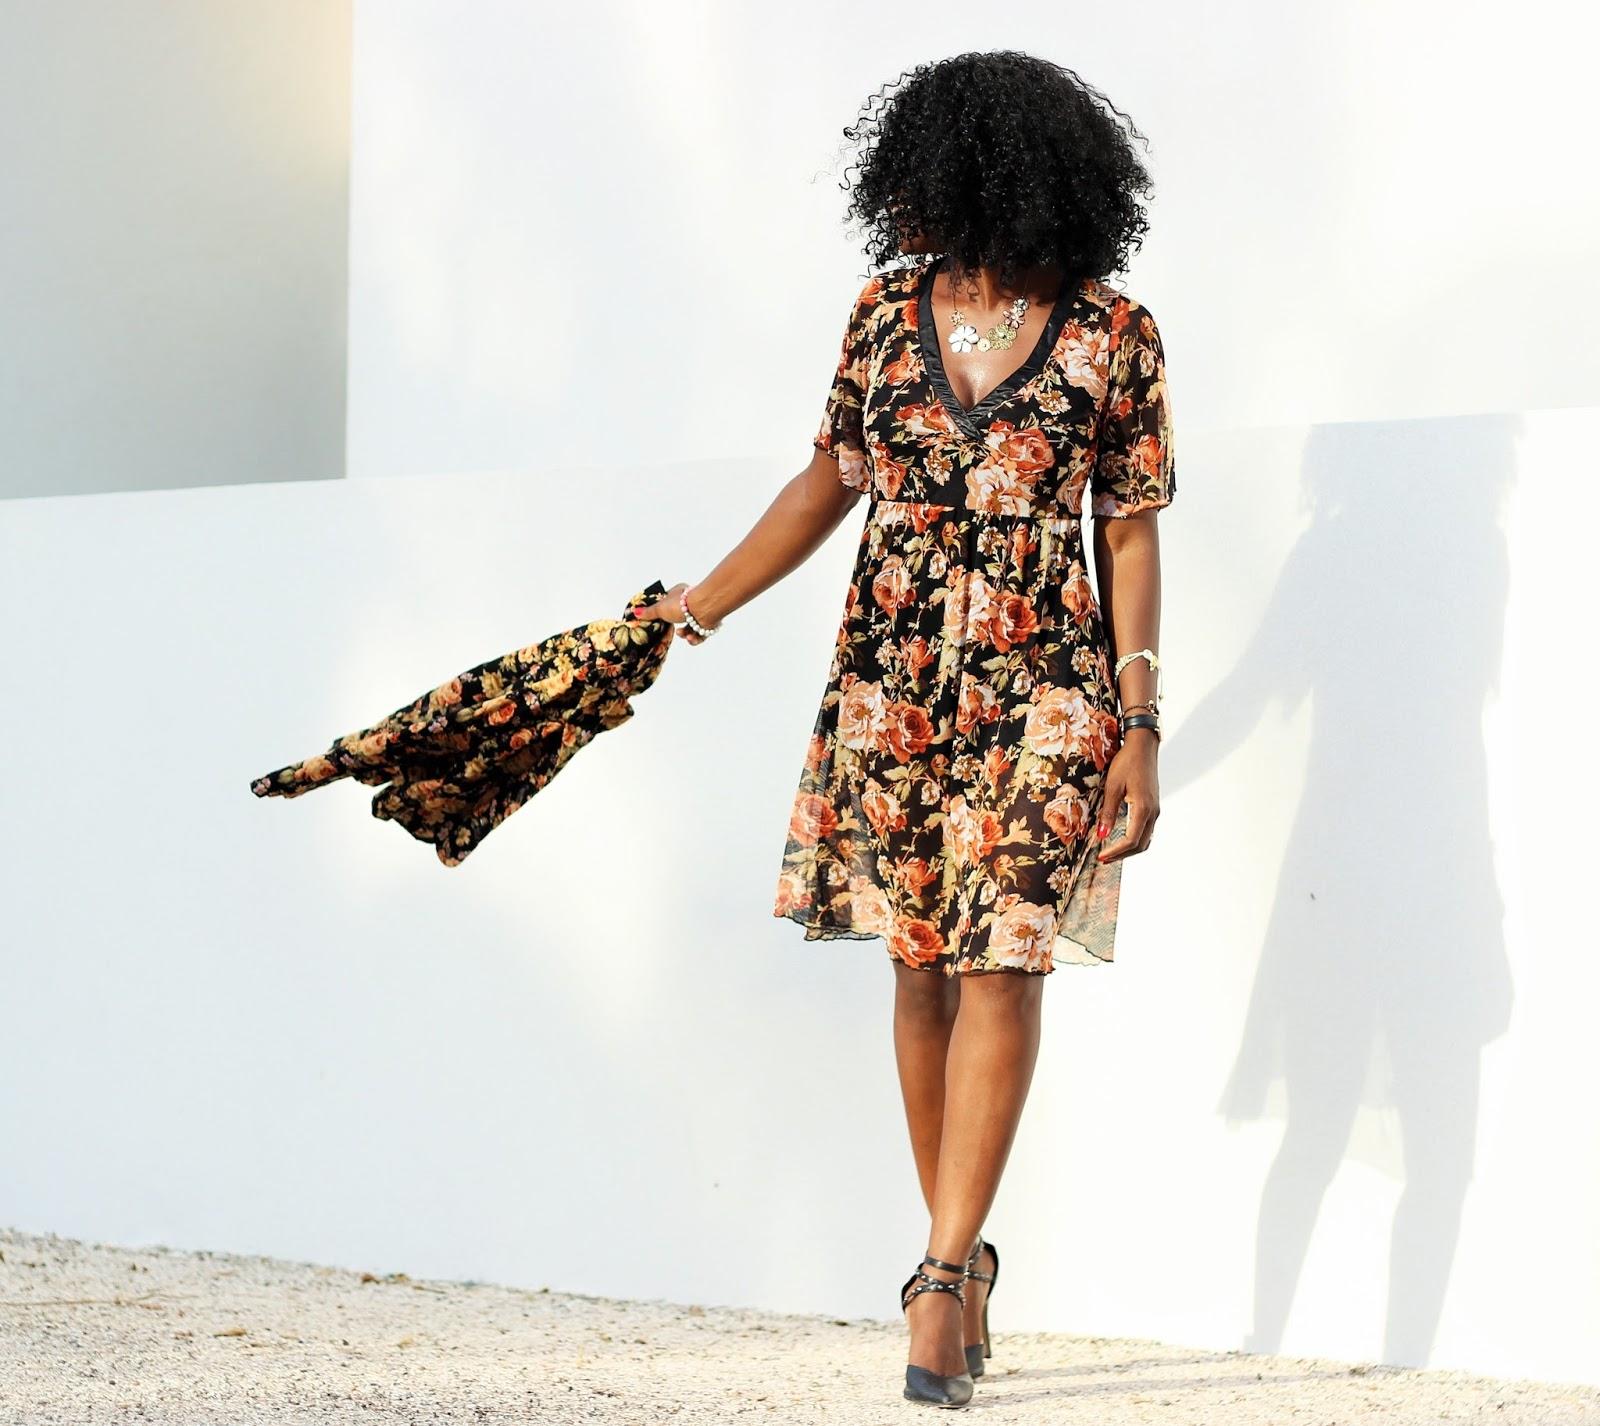 SPRING MIX: FLORAL BLAZER x FLORAL DRESS